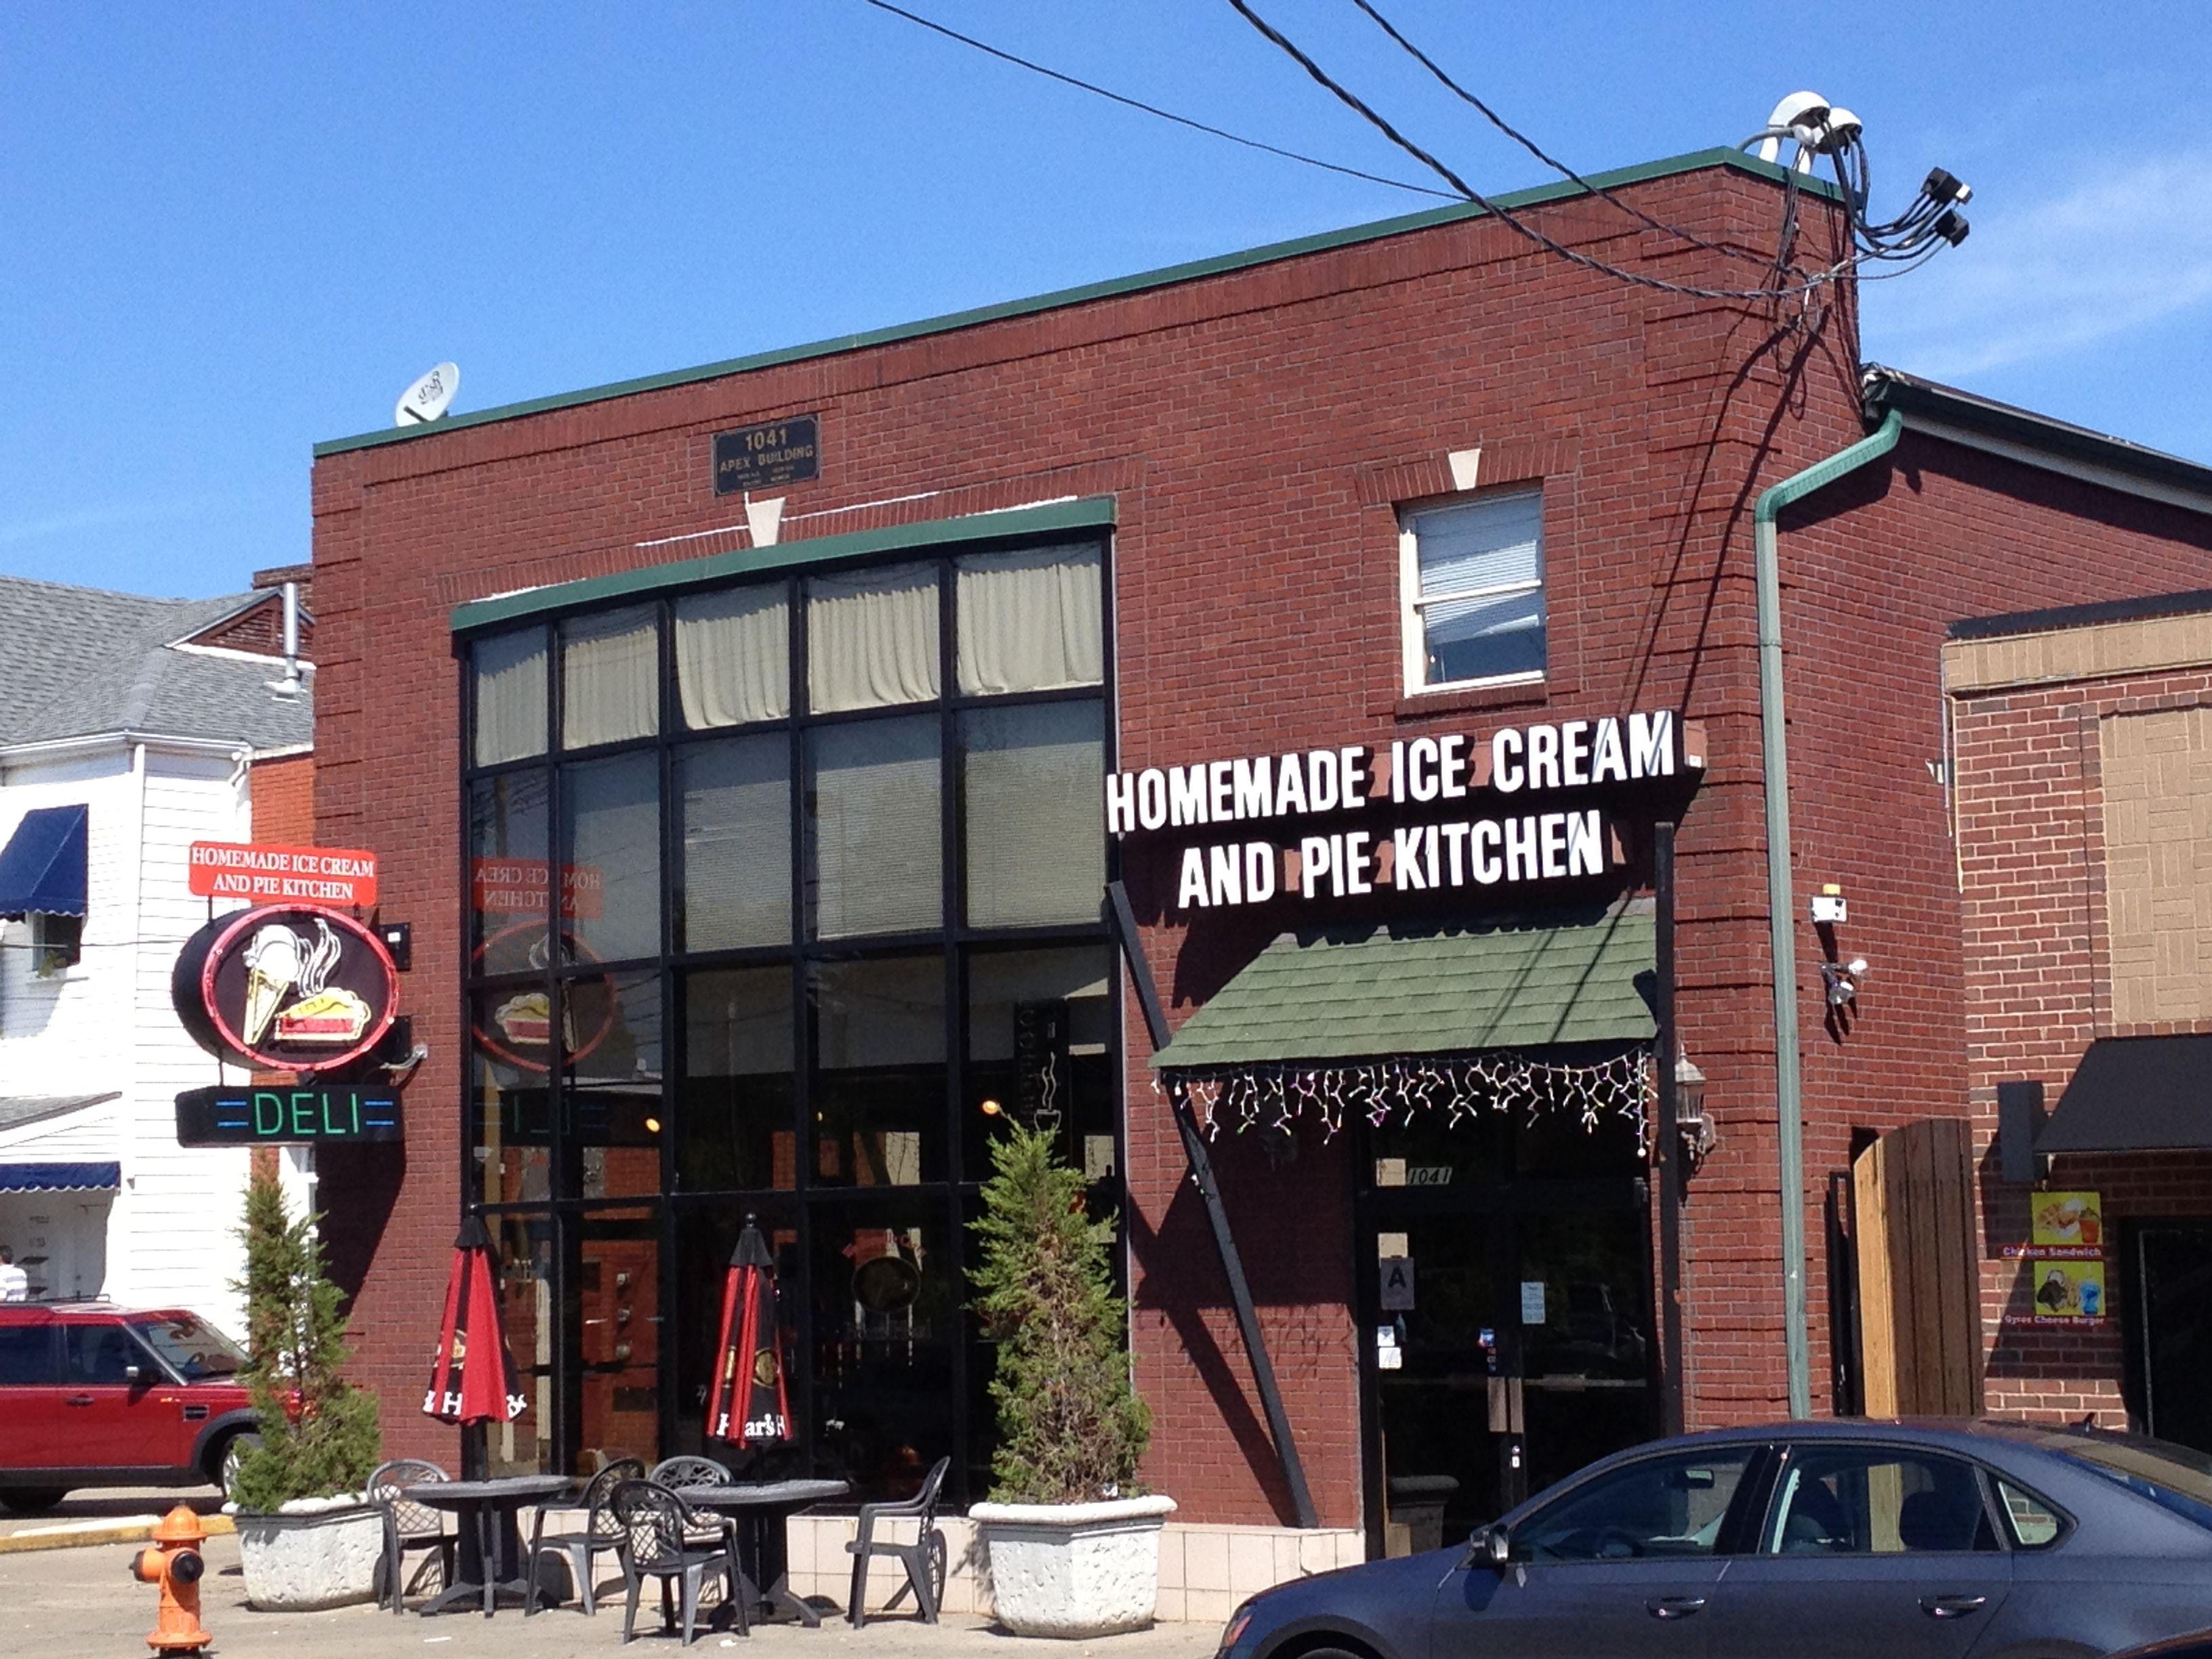 Louisville Ky Pie Kitchen Homemade Ice Cream Homemade Ice